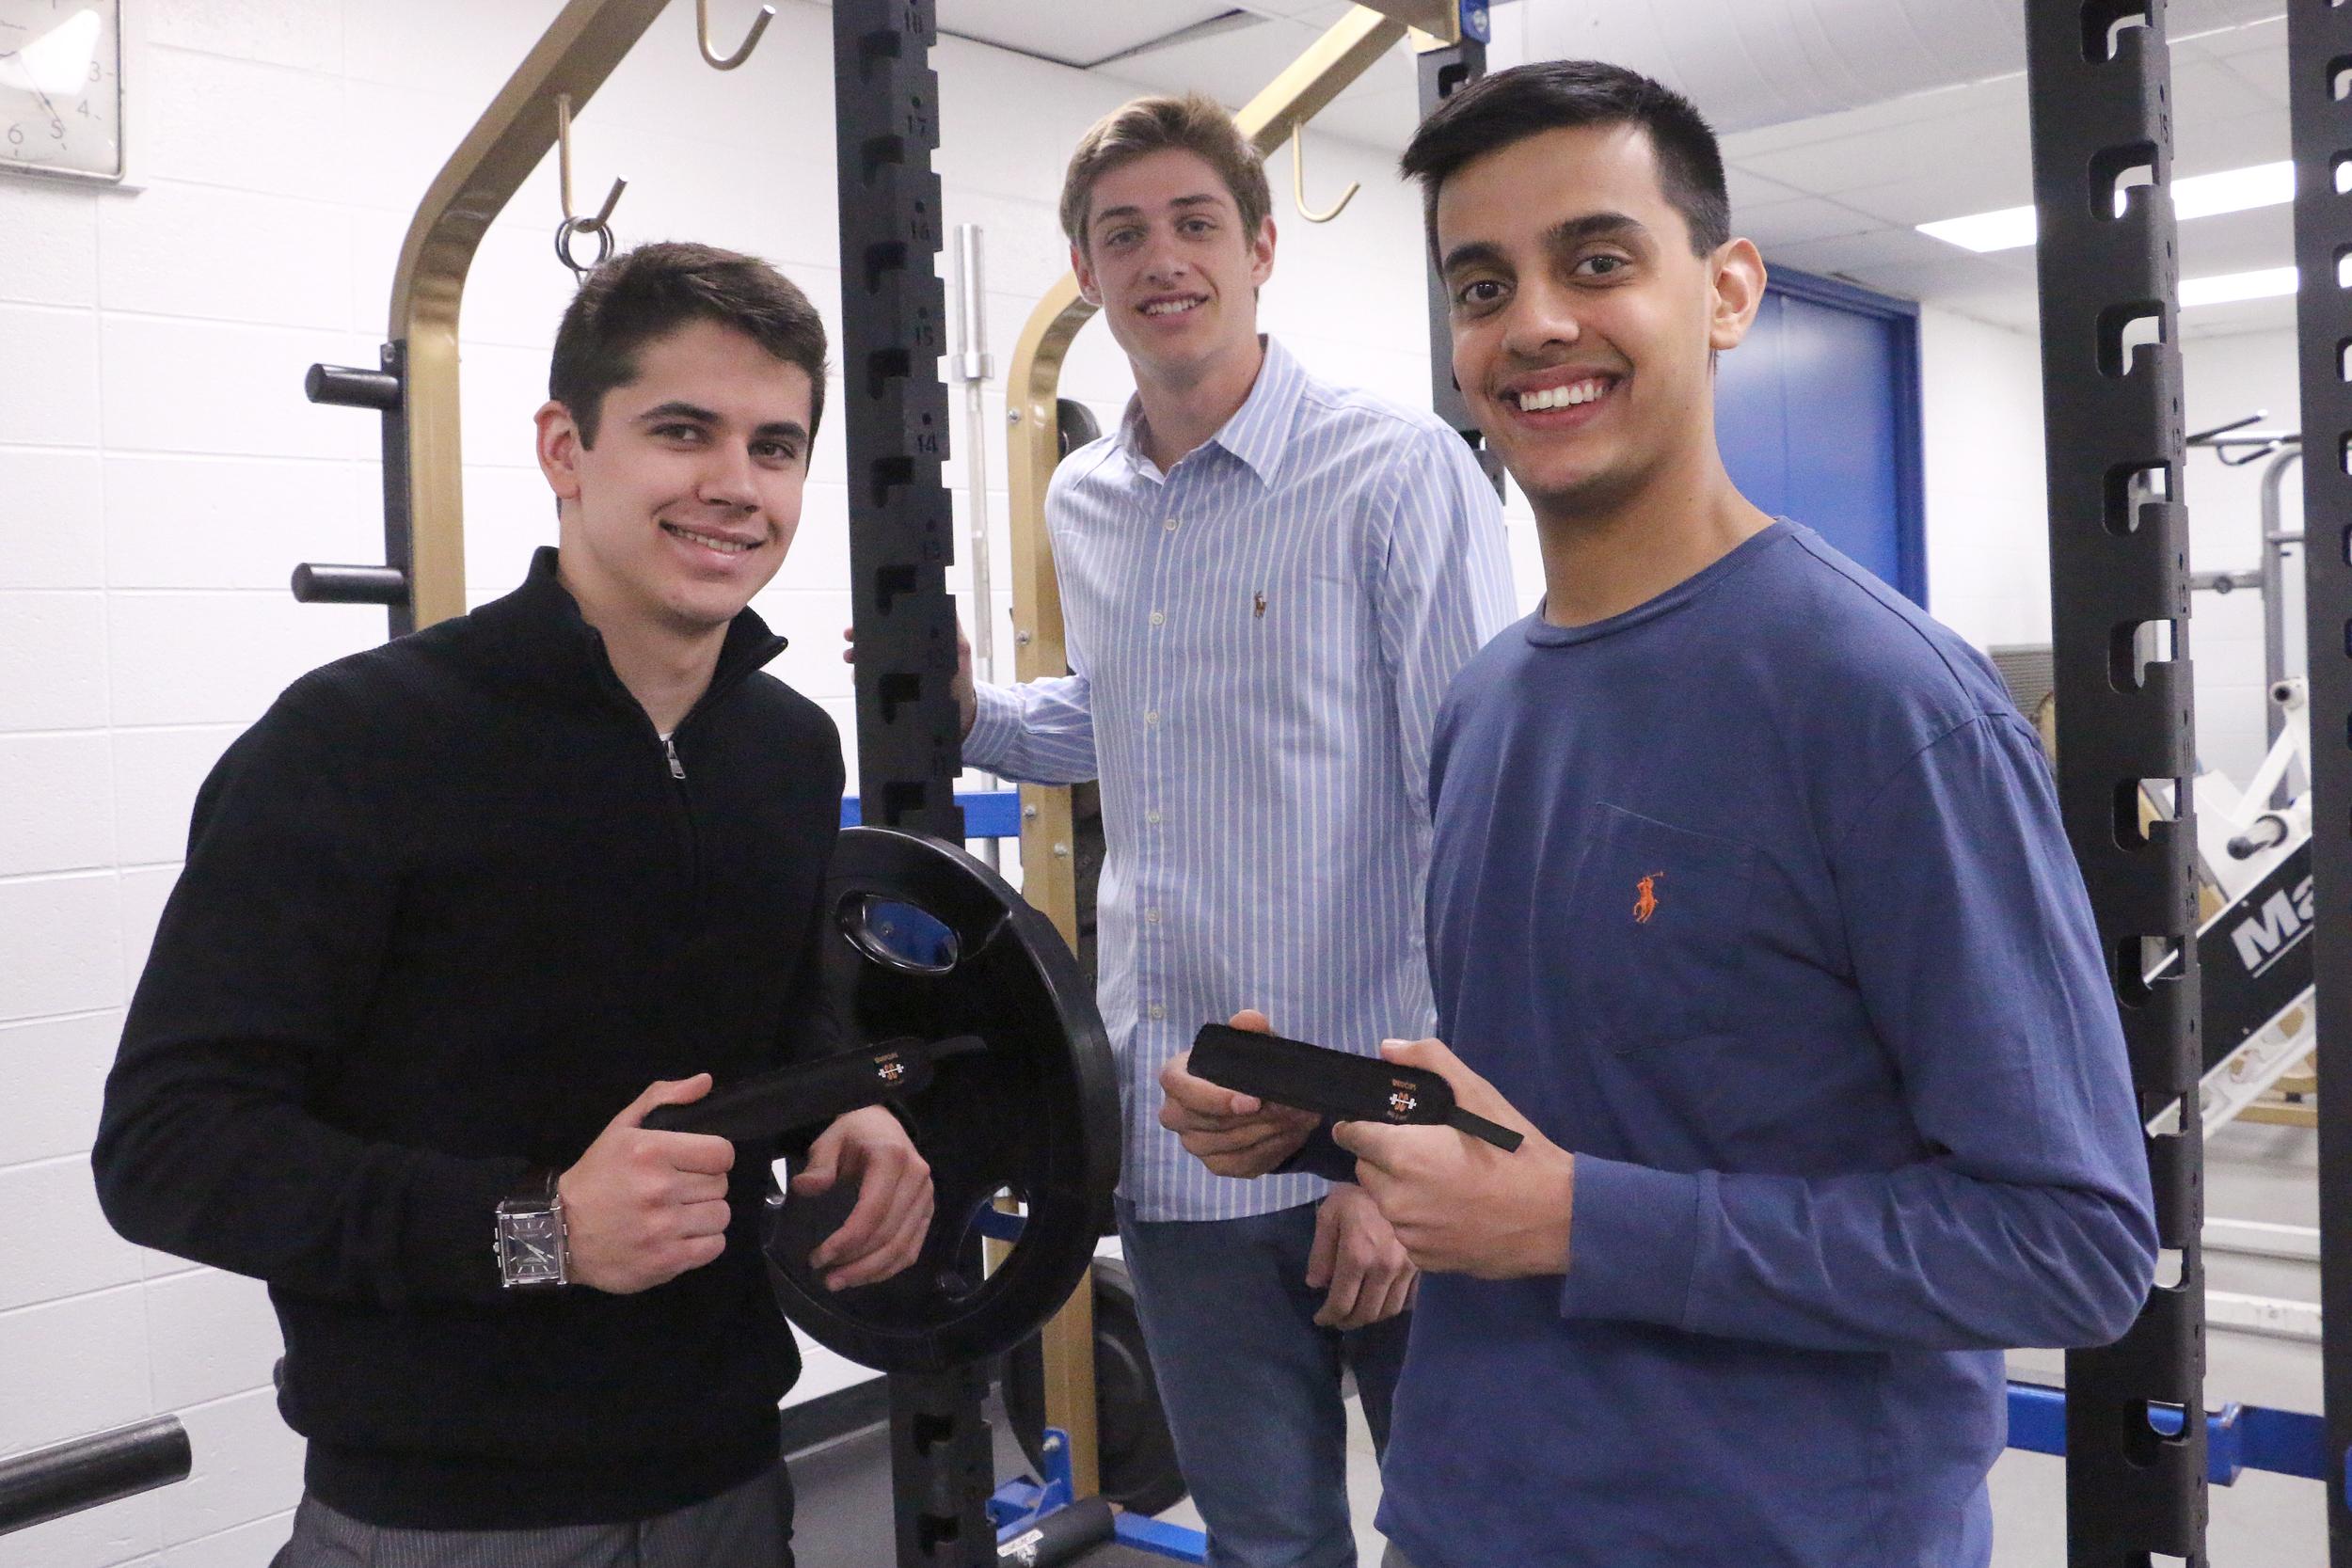 Wheeling seniors Ryan Caulfield,Martin Dimitrov, and Vraj Dharia created SnapClips